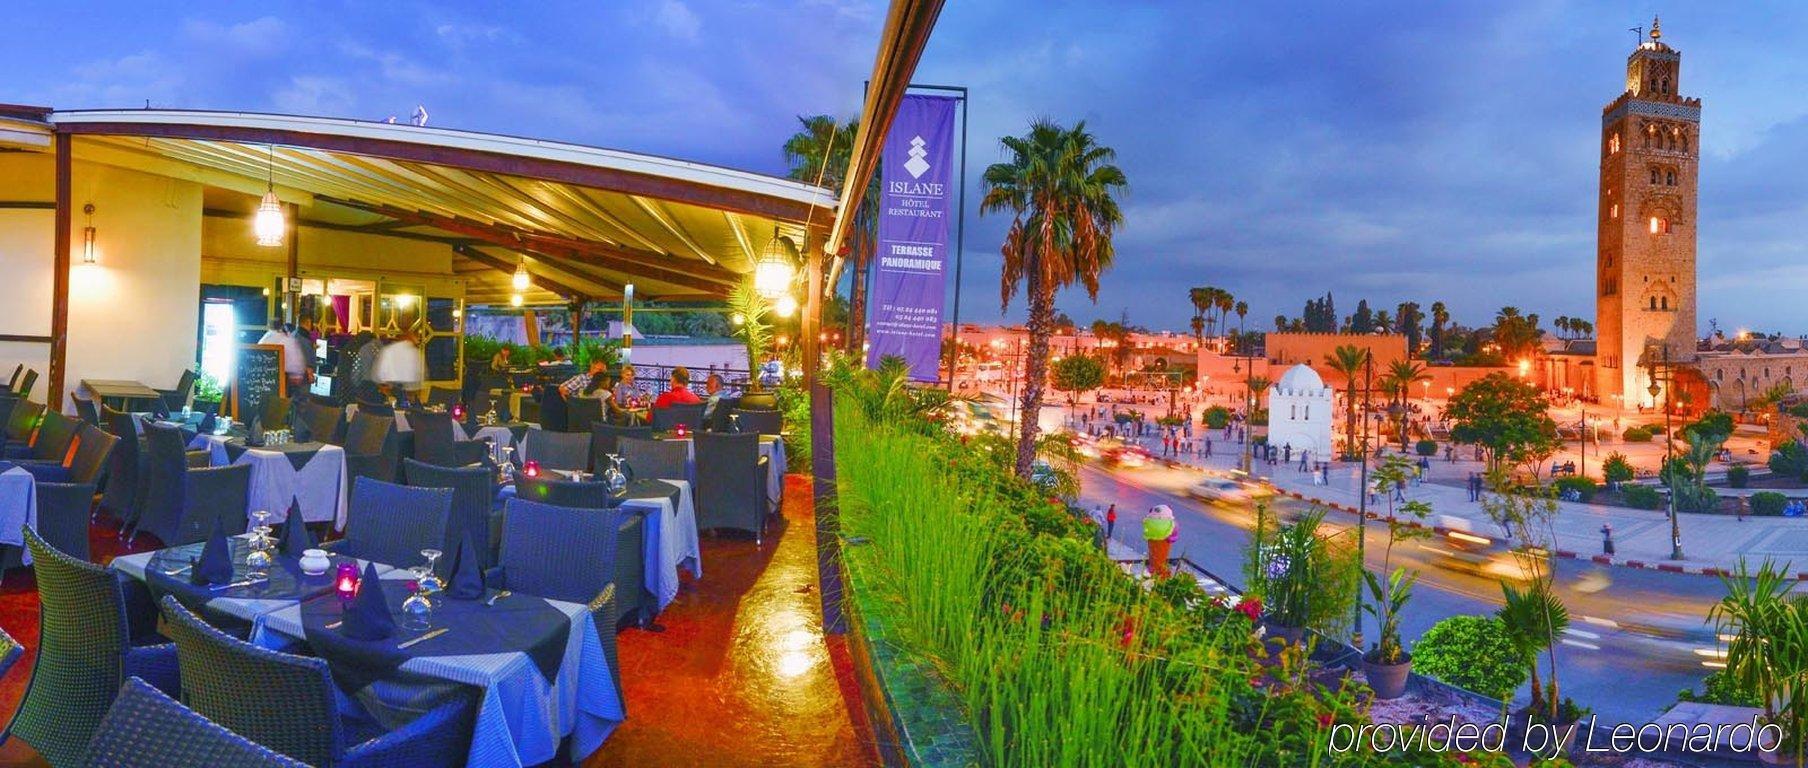 Islane Hotel - Morocco - Marrakech